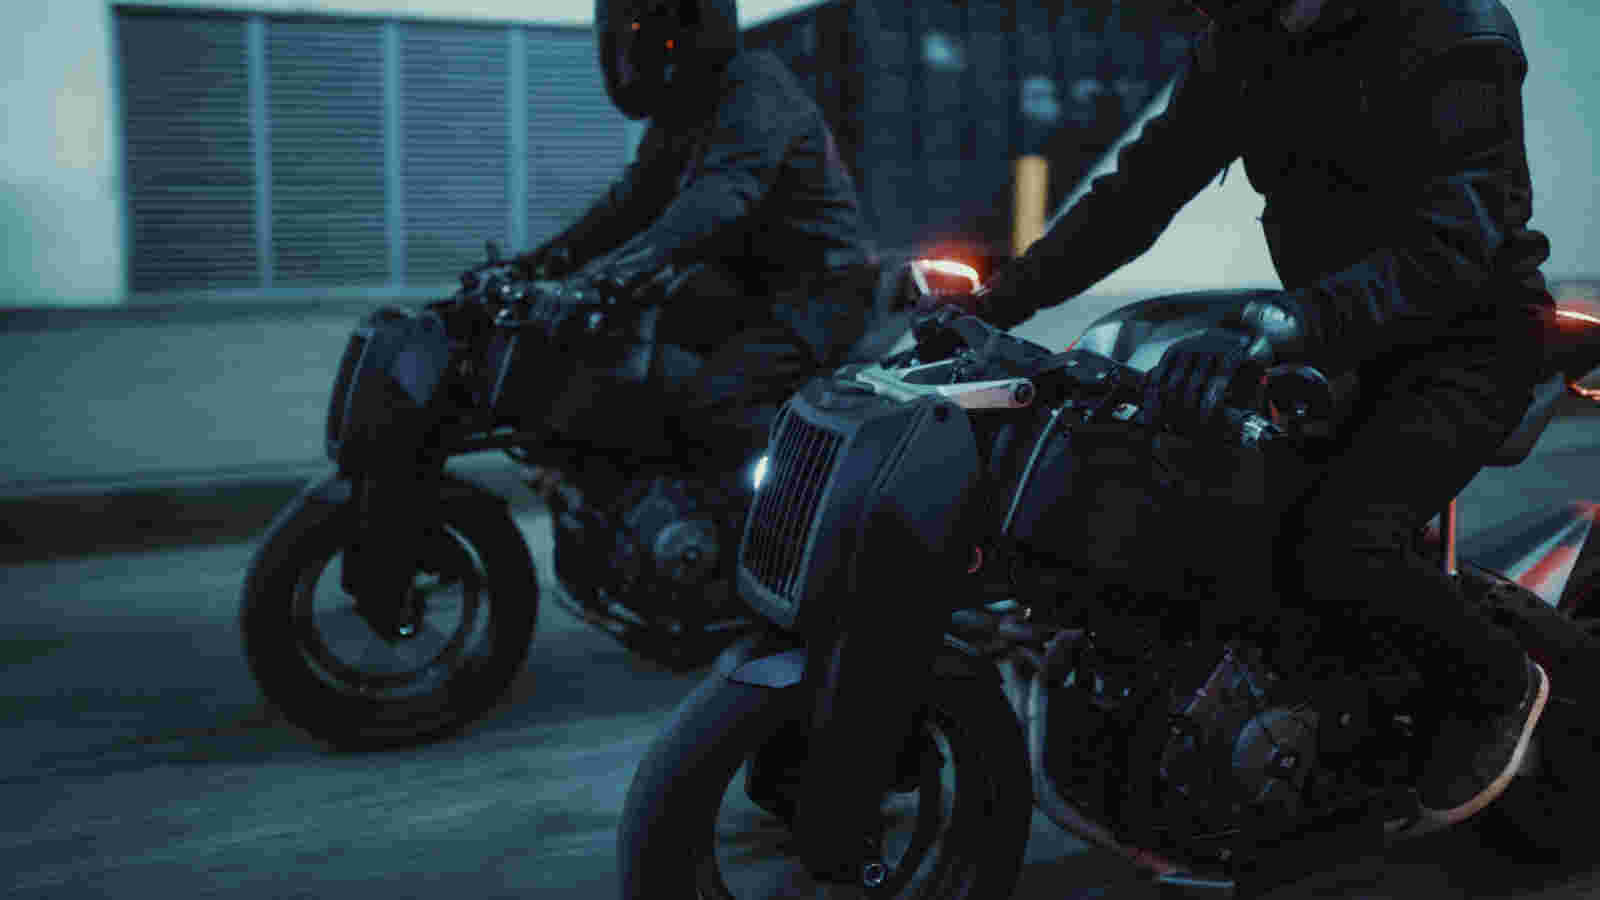 Deanbradshaw Ronin Motorcycle4